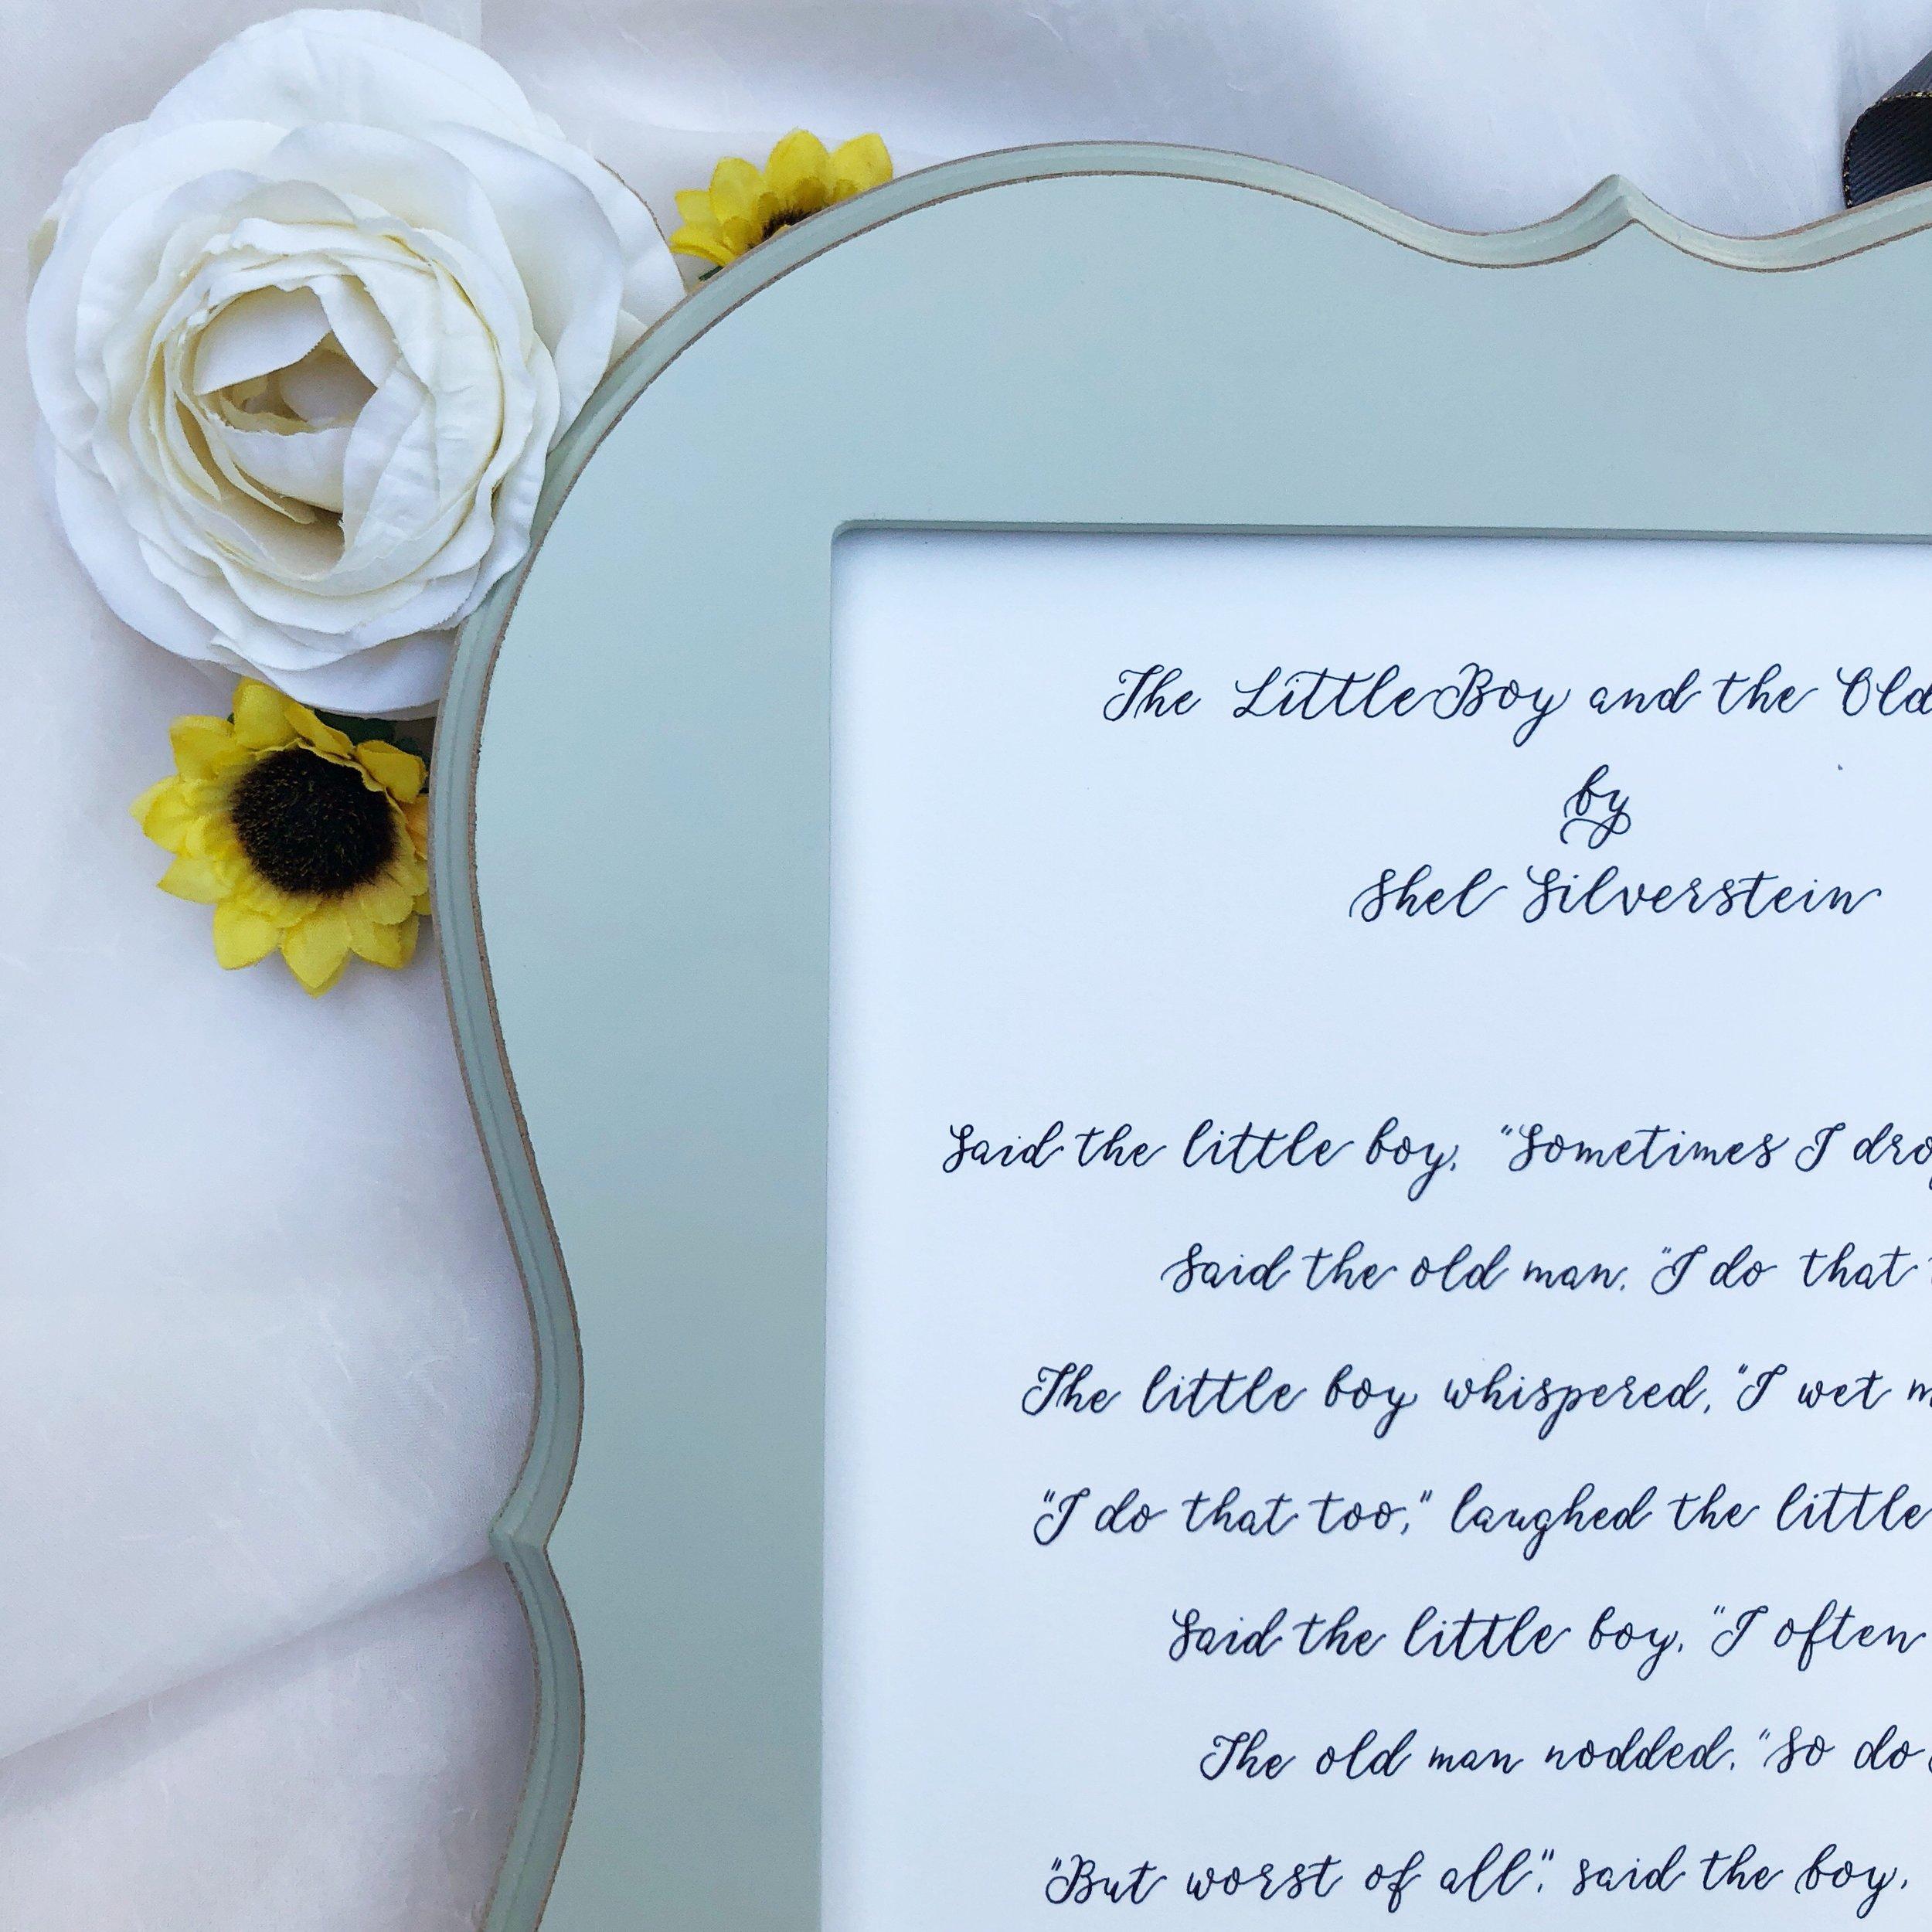 Central PA, York PA, JesSmith Designs, custom, wedding, invitations, bridal, announcements, save the date, baby, hanover, calligraphy, baltimore, wedding invitations, lancaster, gettysburg-05-24 11.51.43.jpg